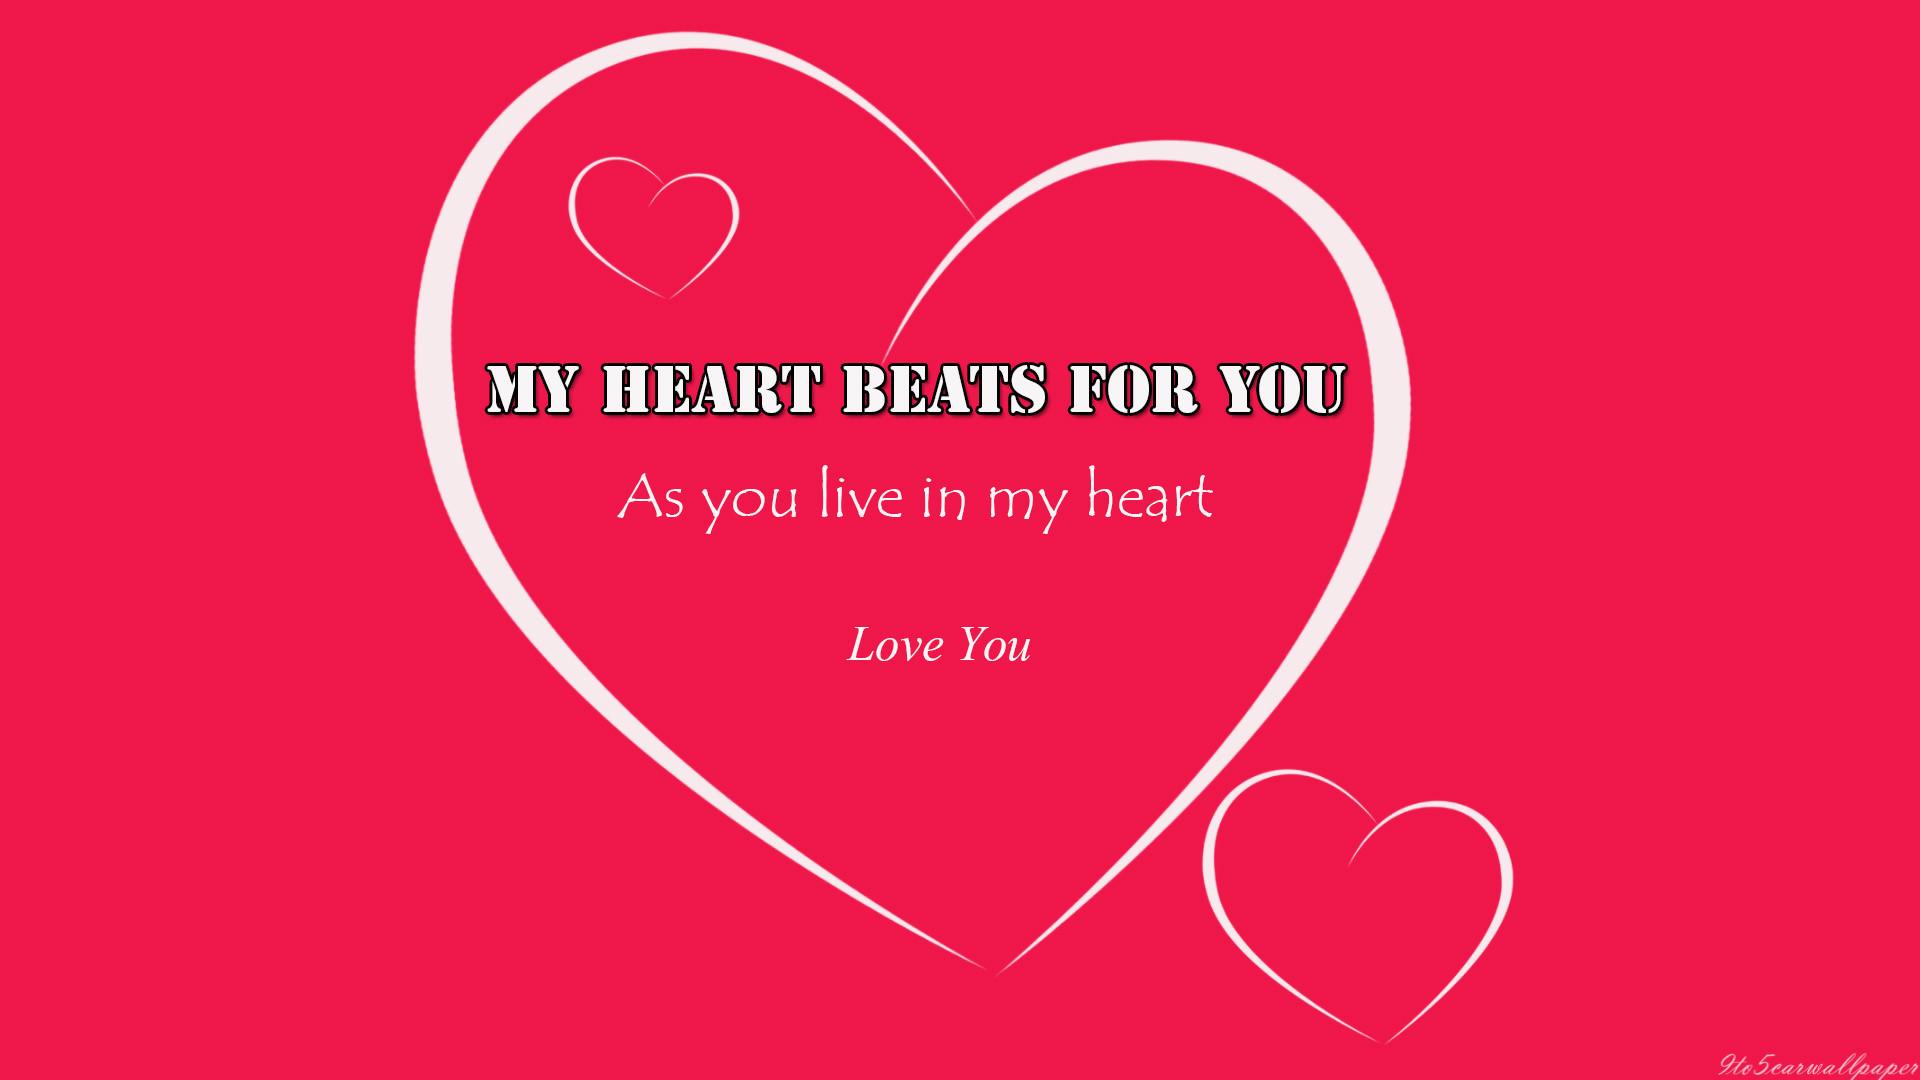 Res 2160x1920 Heart 58323 Hd Wallpaper Backgrounds